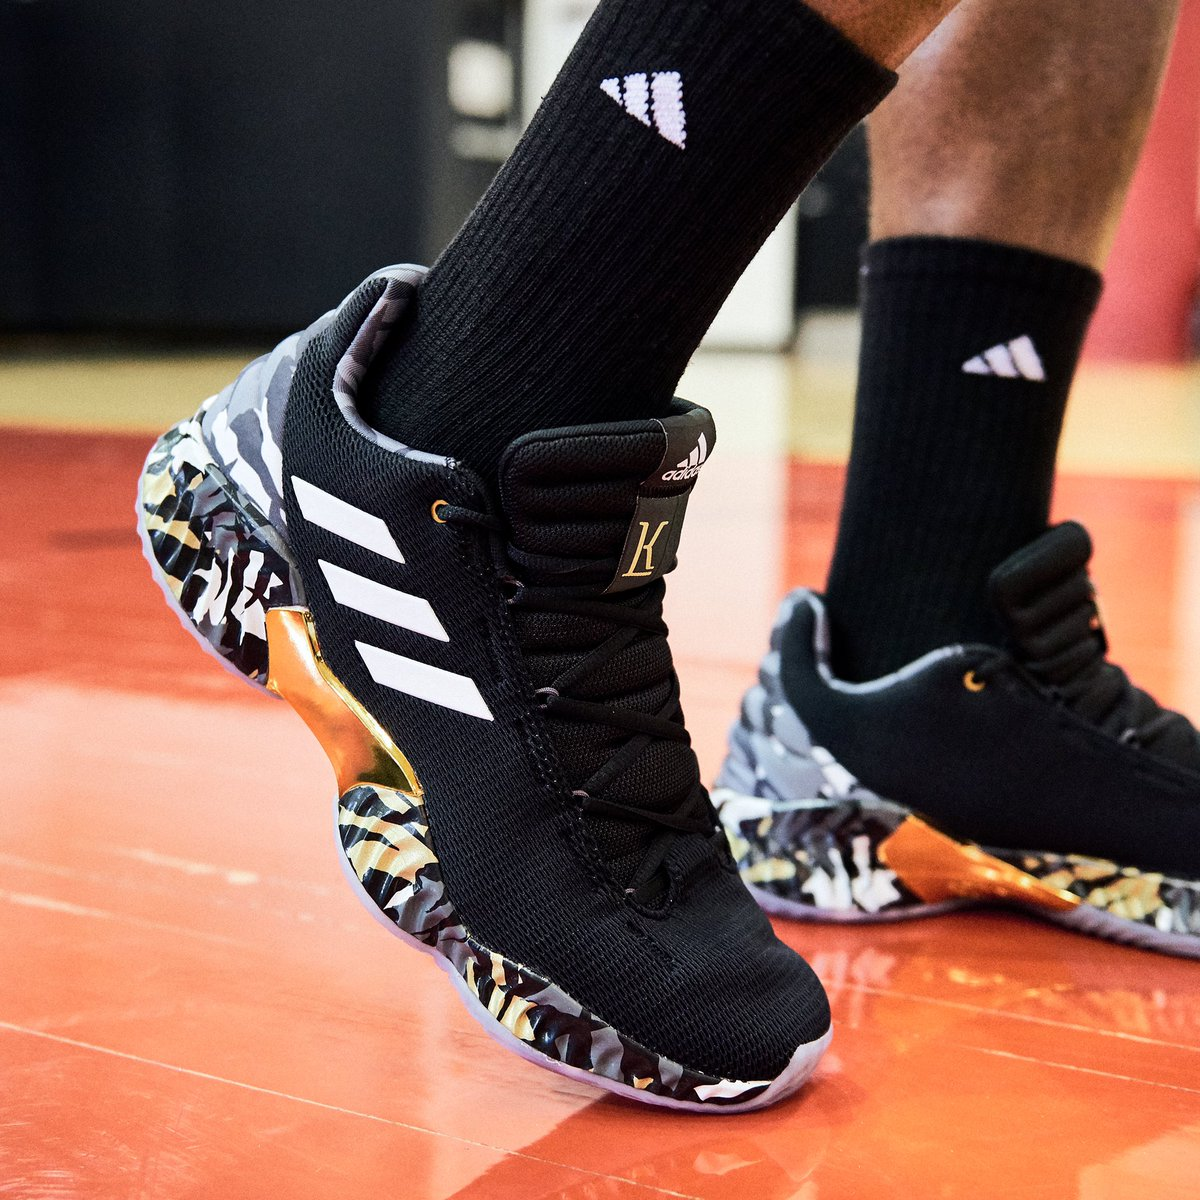 6462666a7172d adidas Basketball and adidas Canada